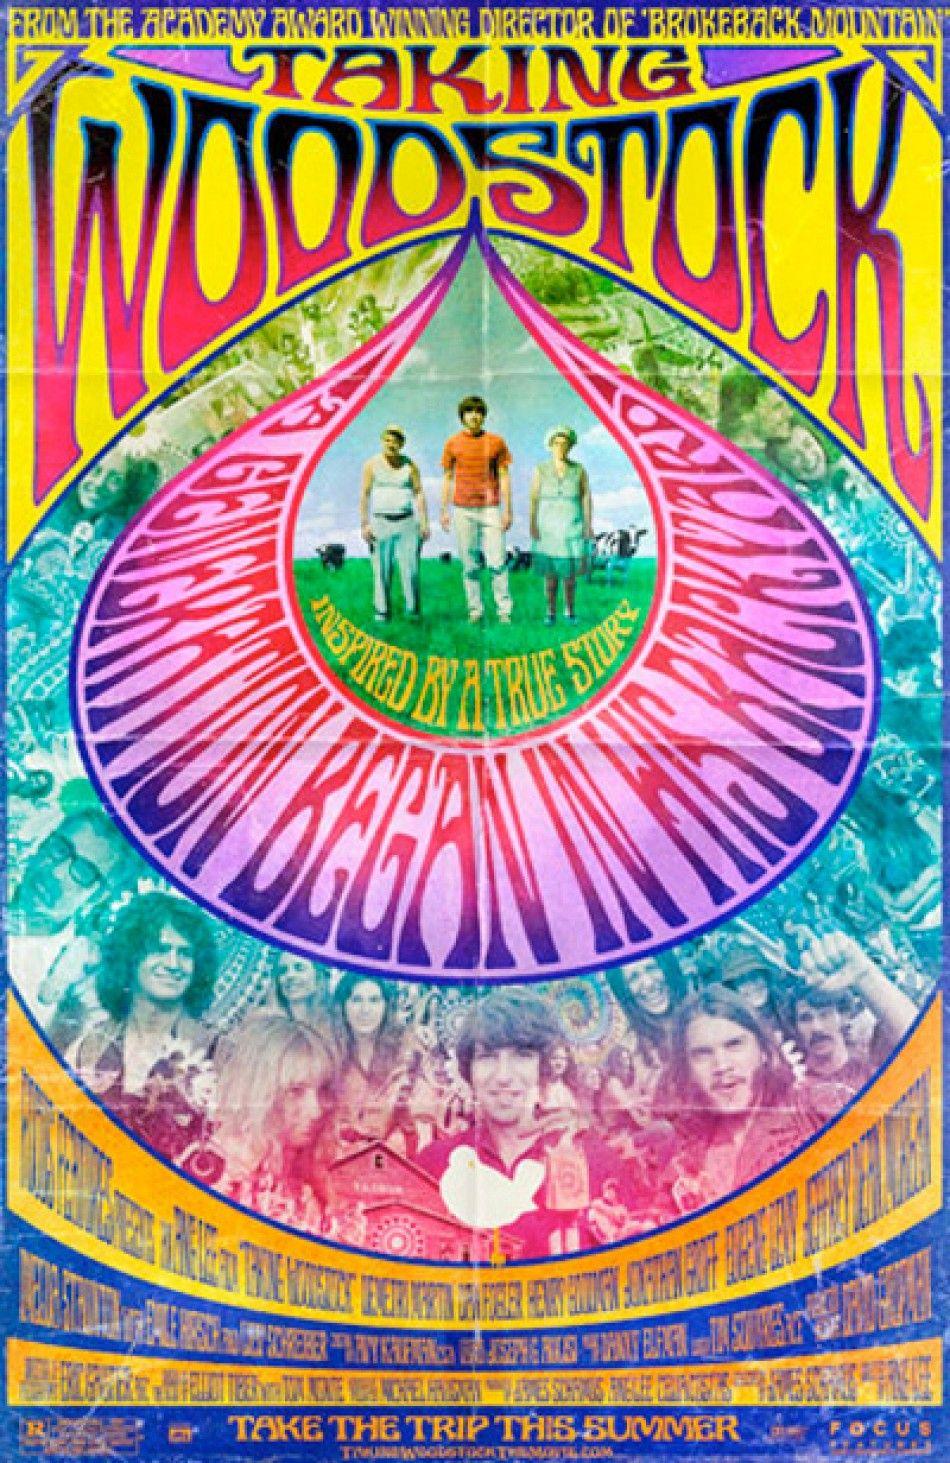 The Woodstock Poster. | Design & Color | Pinterest